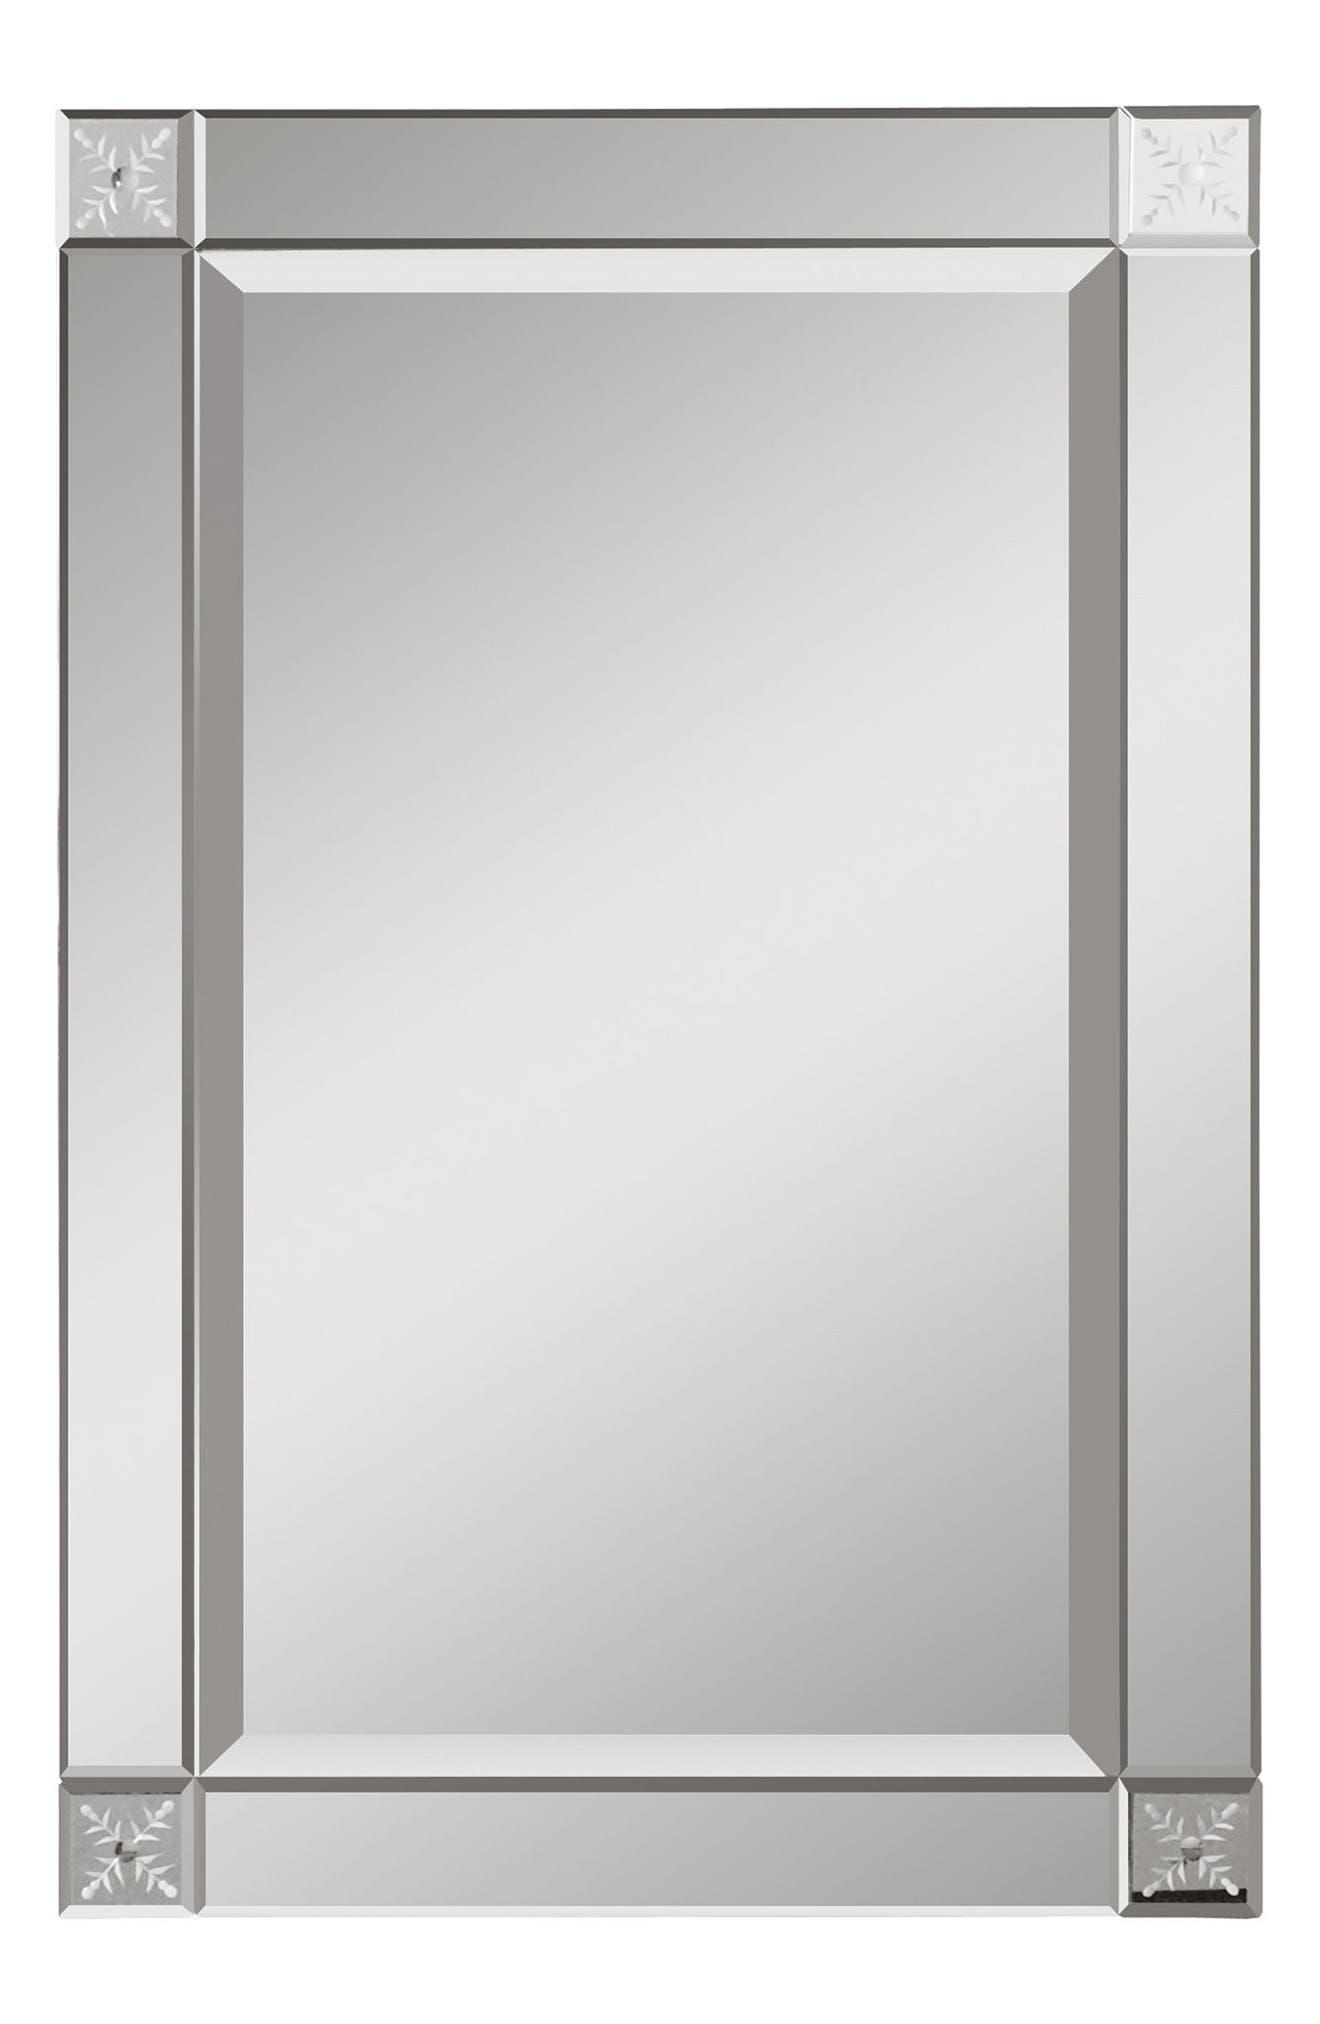 Emberlynn Frameless Wall Mirror,                         Main,                         color, Metallic Silver